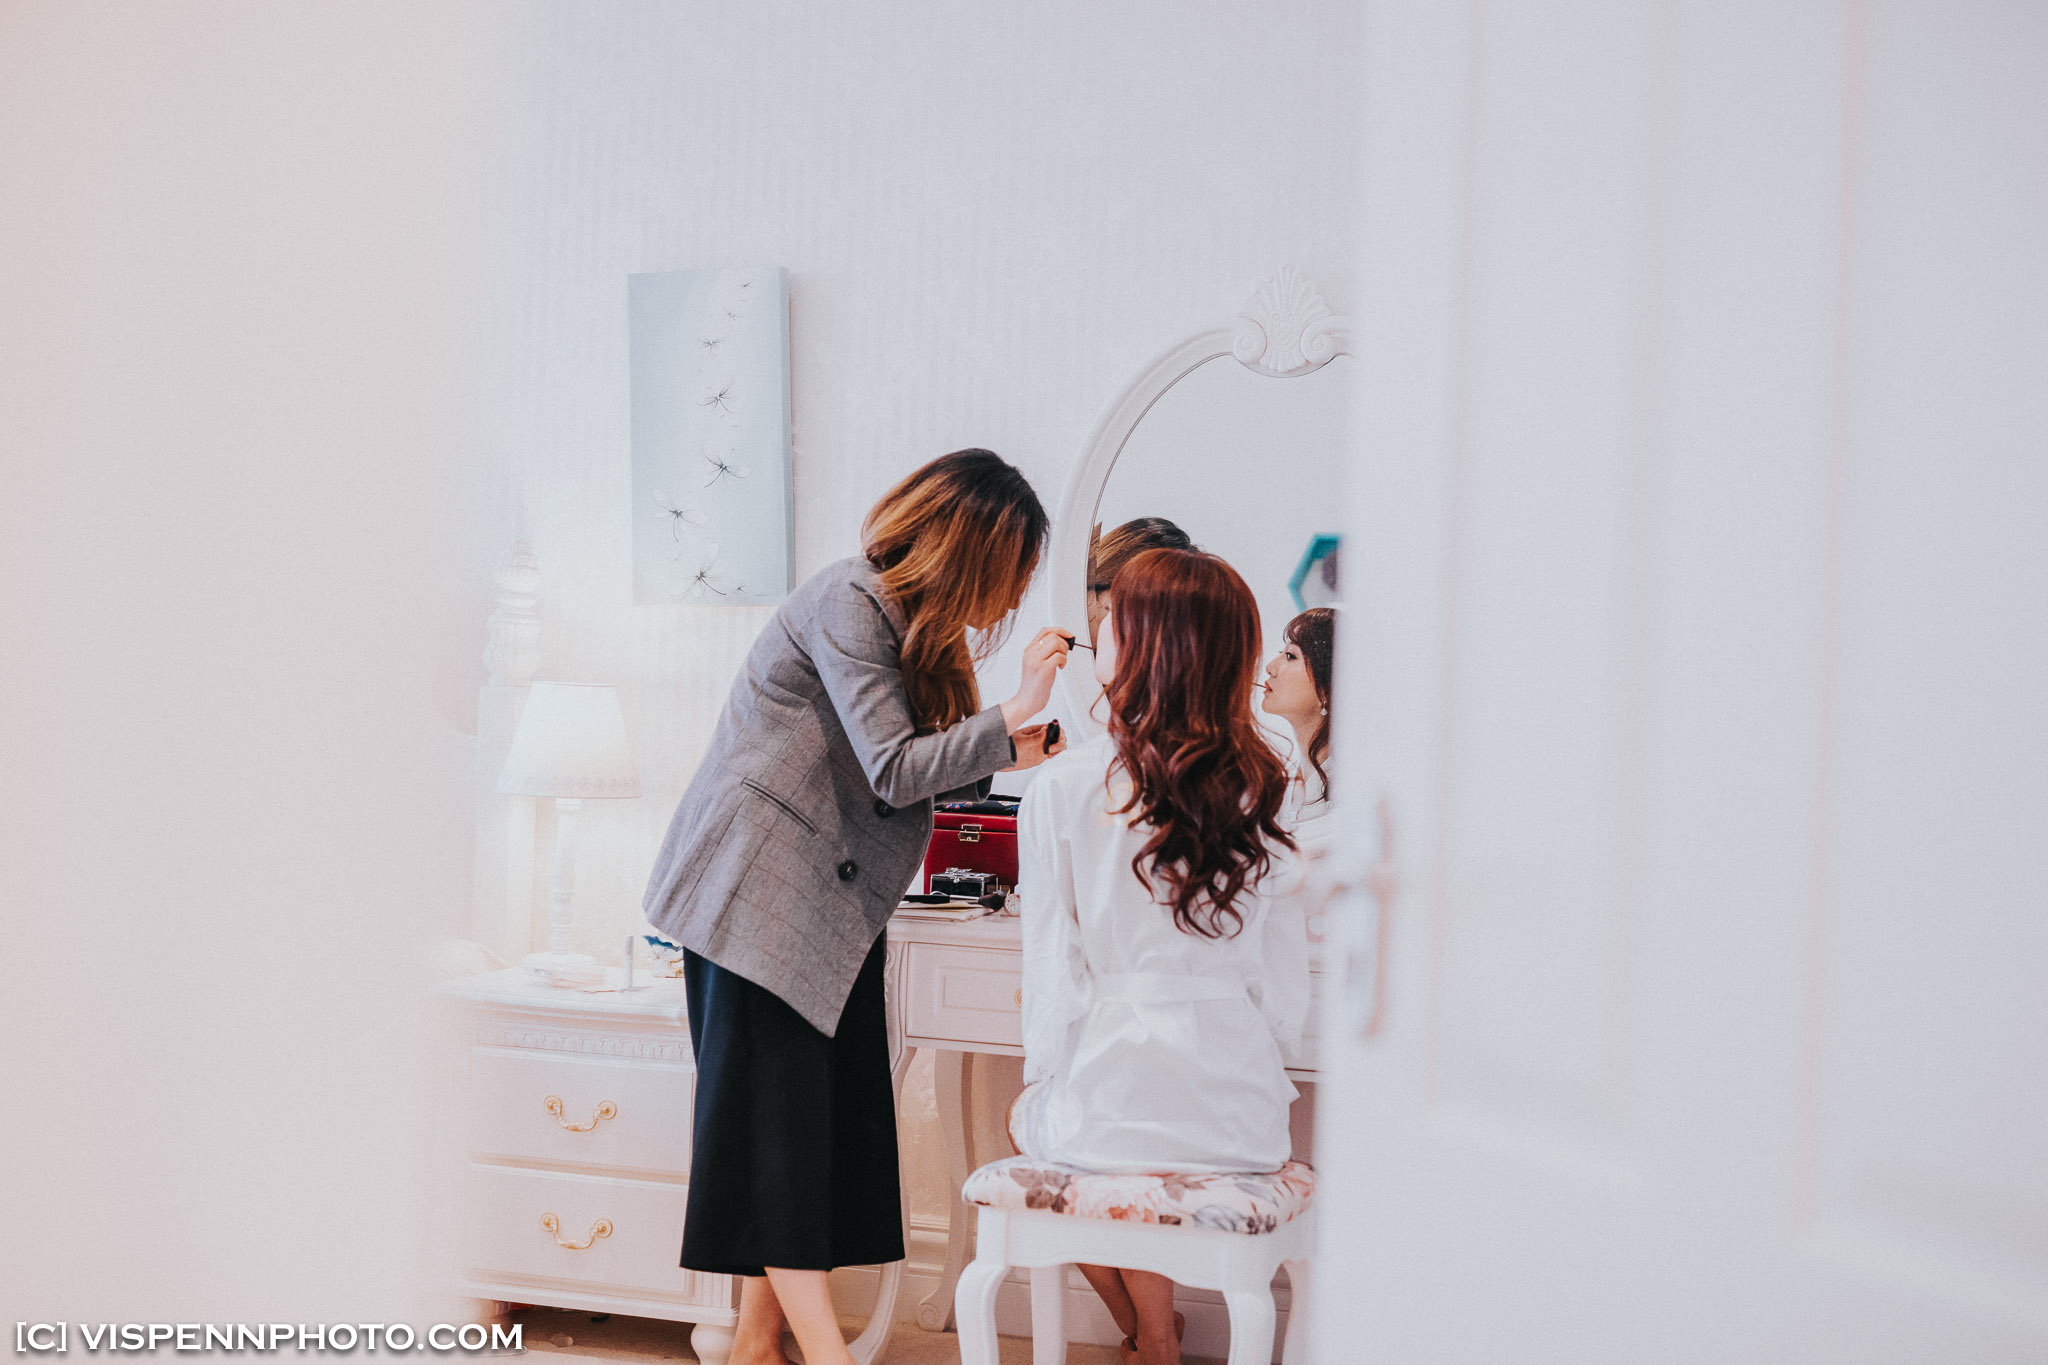 WEDDING DAY Photography Melbourne VISPENN 墨尔本 婚礼跟拍 婚礼摄像 婚礼摄影 结婚照 登记照 VISPENN 0028 5D4 0899